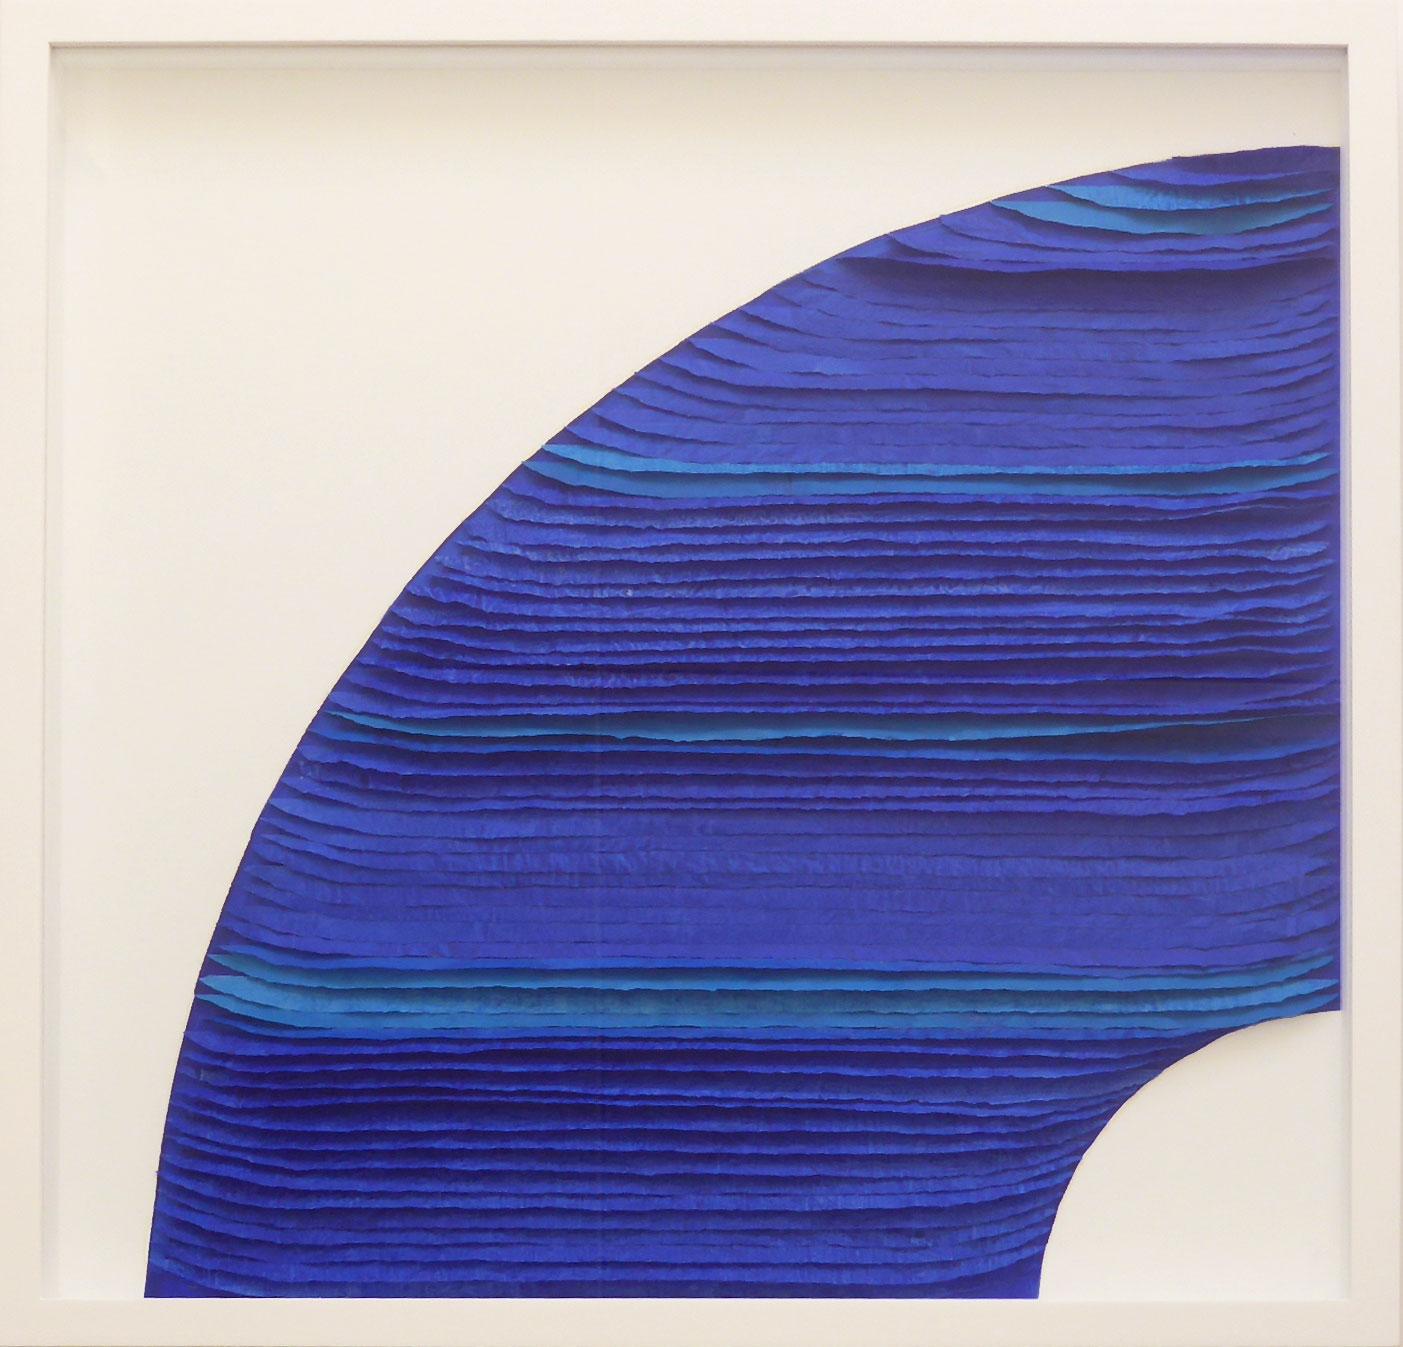 Frieda Martha Papierarbeit, Farbe sehen blau, 2015